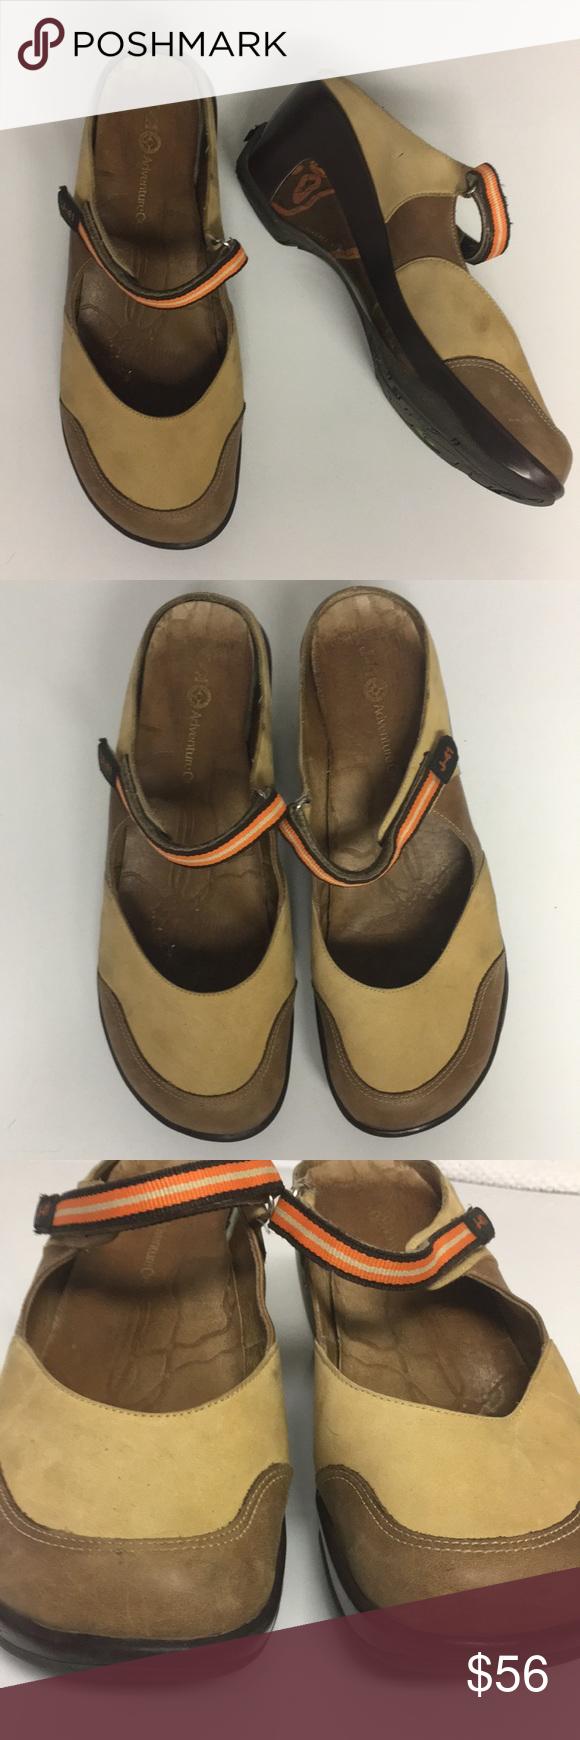 J41 Adventure On Marco Polo Slip On Heeled Shoes Shoes